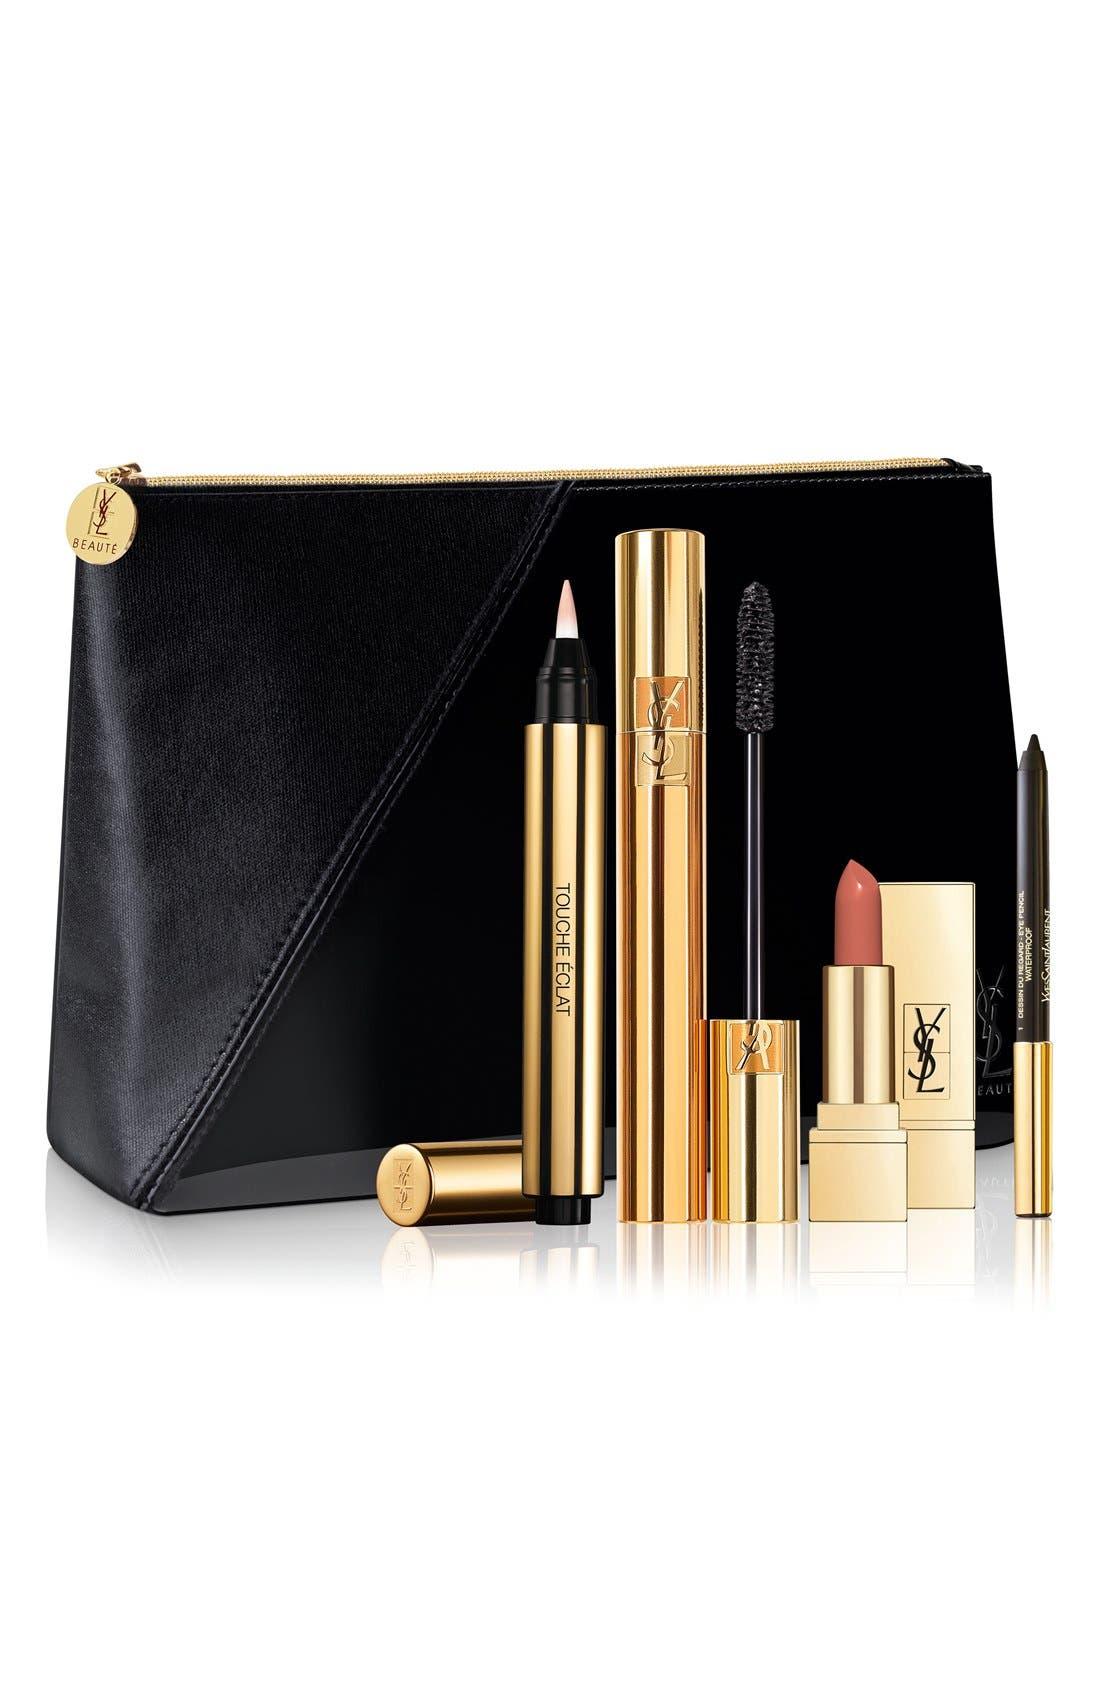 Yves Saint Laurent Essential Makeup Set Limited Edition Usd 96 Value Nordstrom